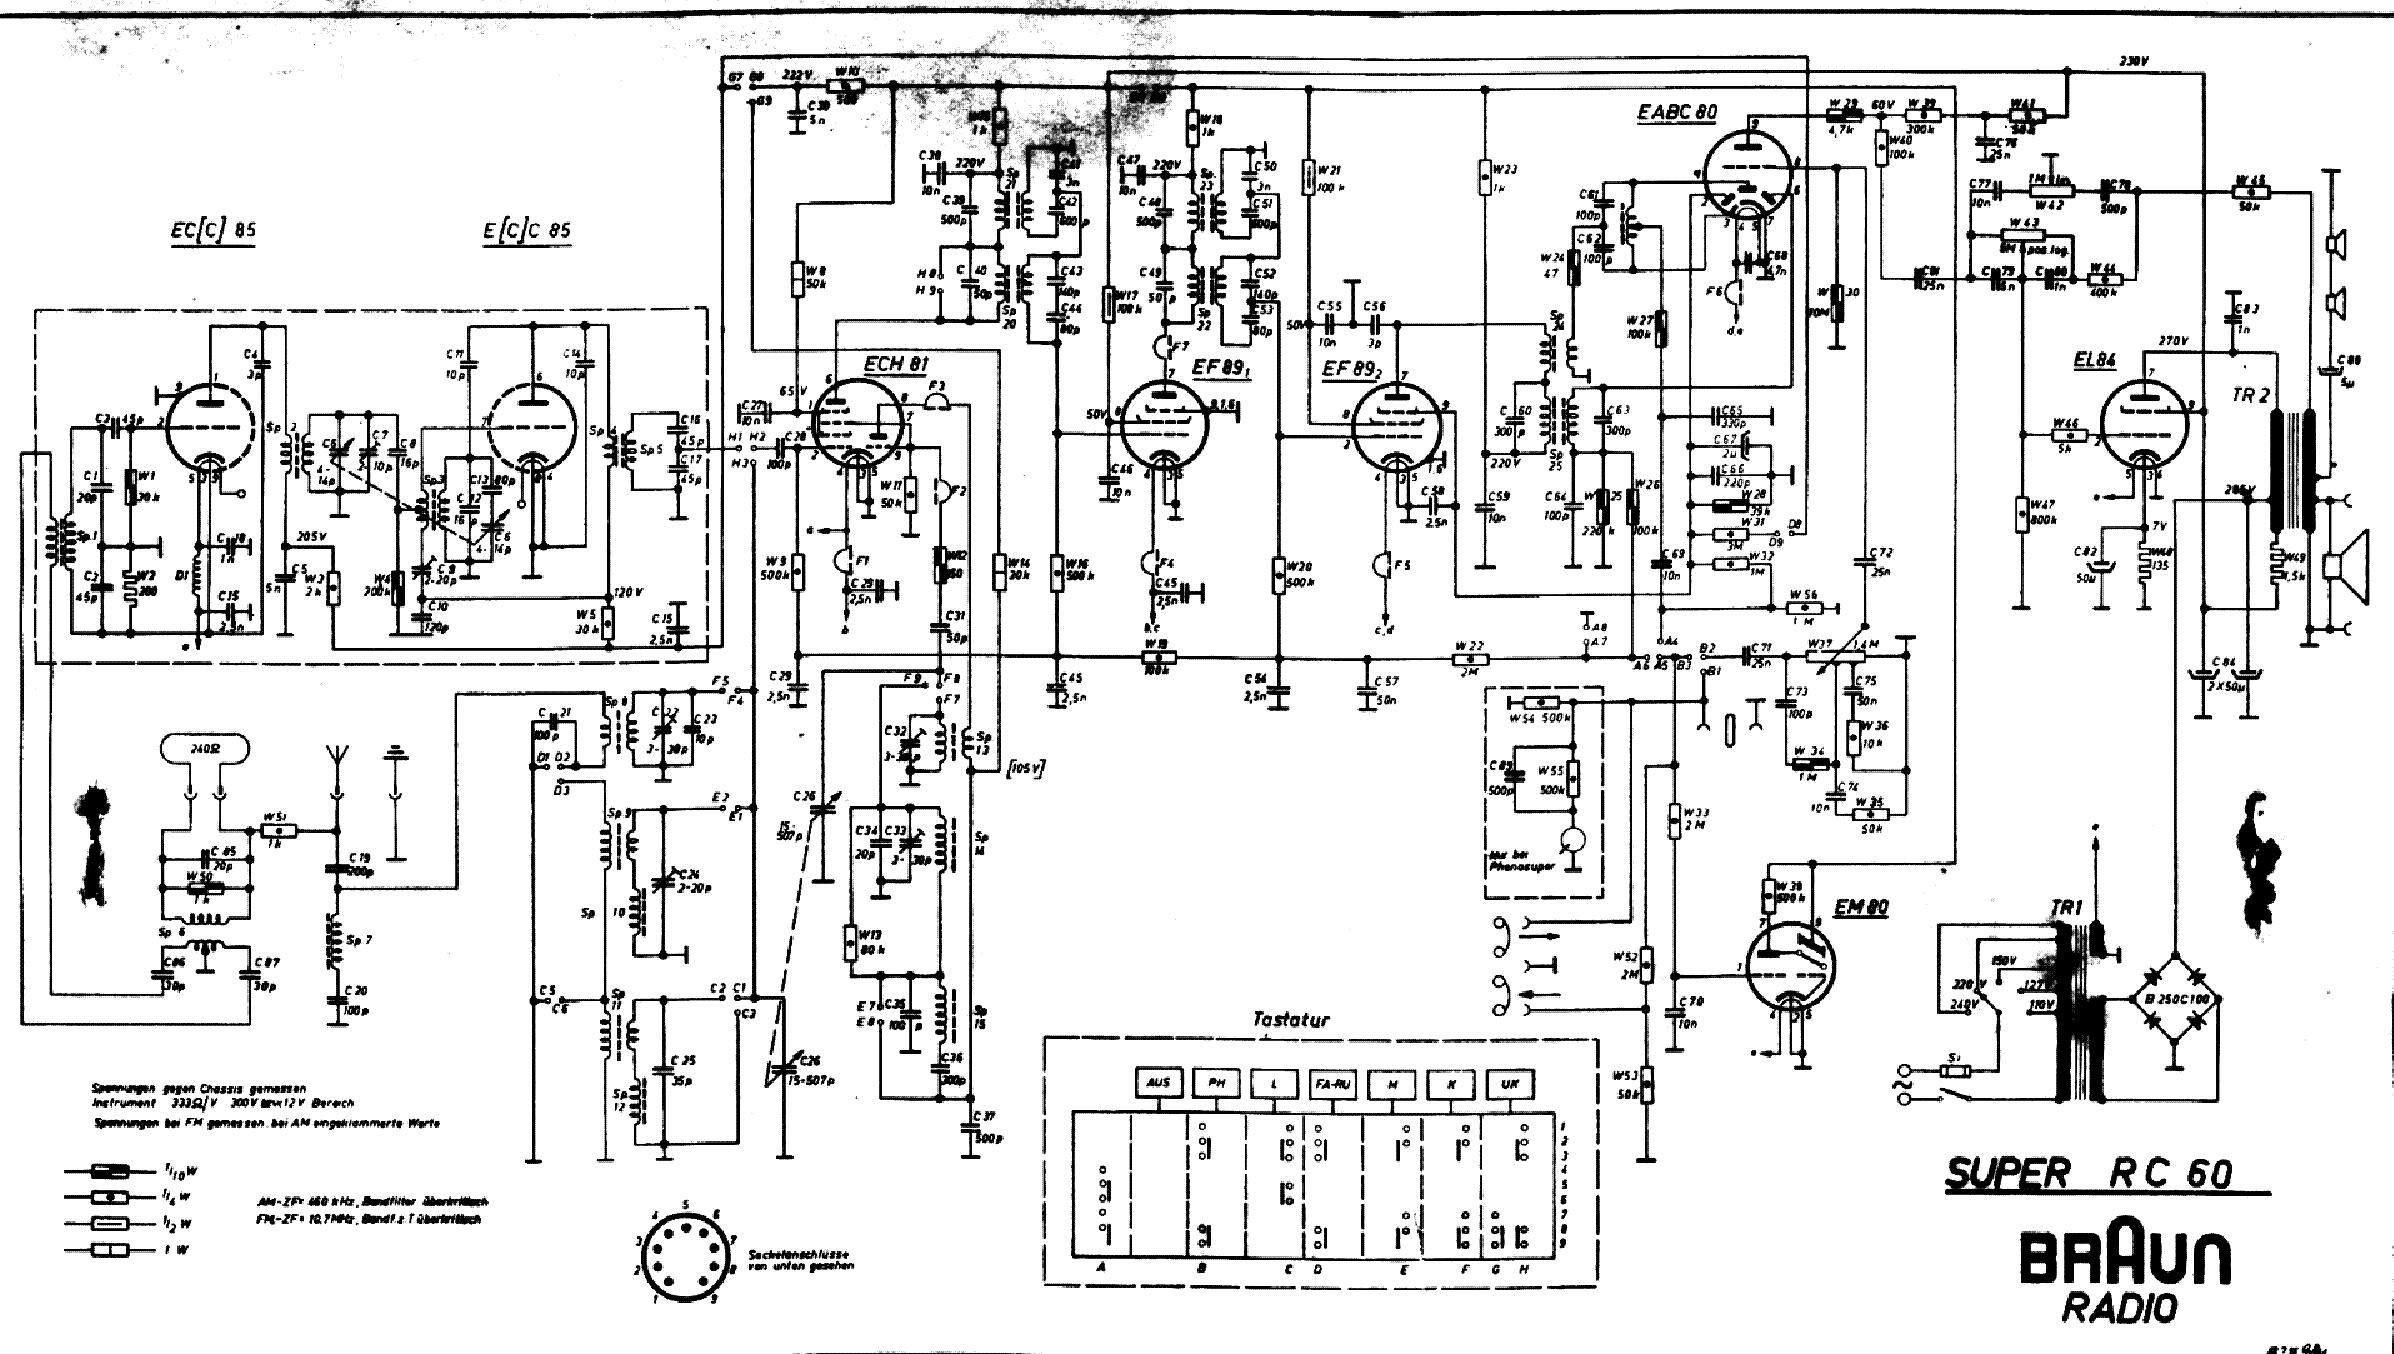 cat rc60 forklift wiring diagram cat p5000 wiring diagram